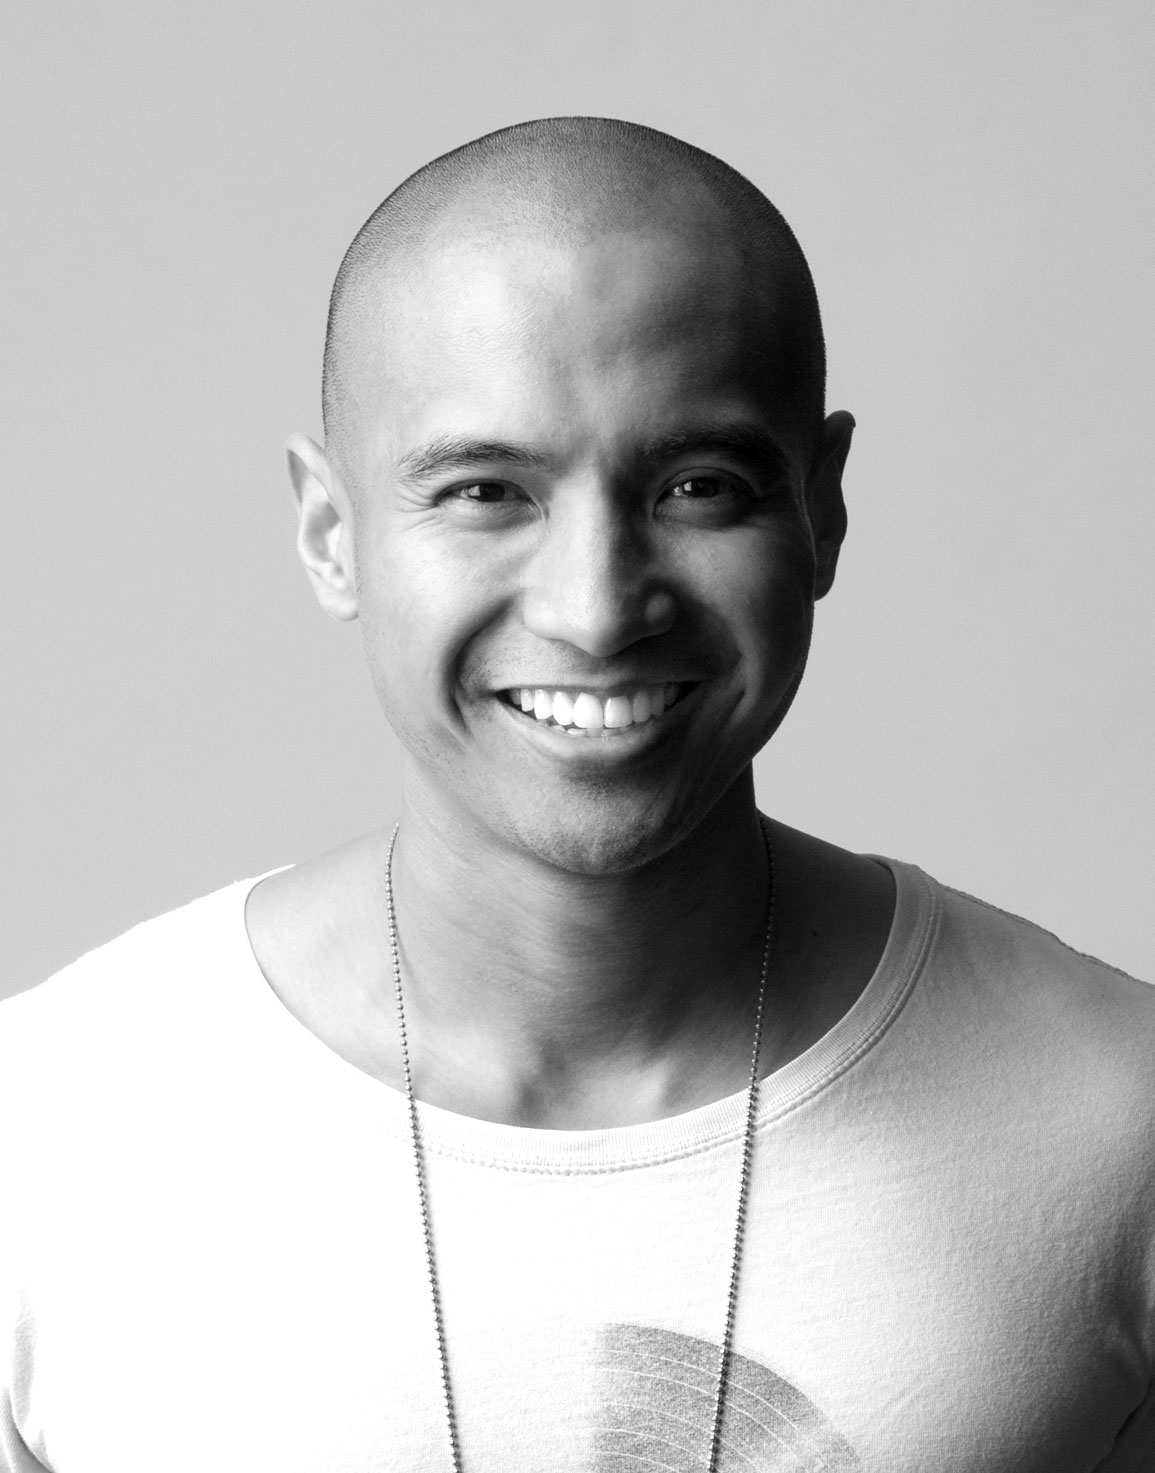 Ram_Castillo_Profile_Head-shot_Pic_Low-Res-cropped-B&W].jpg